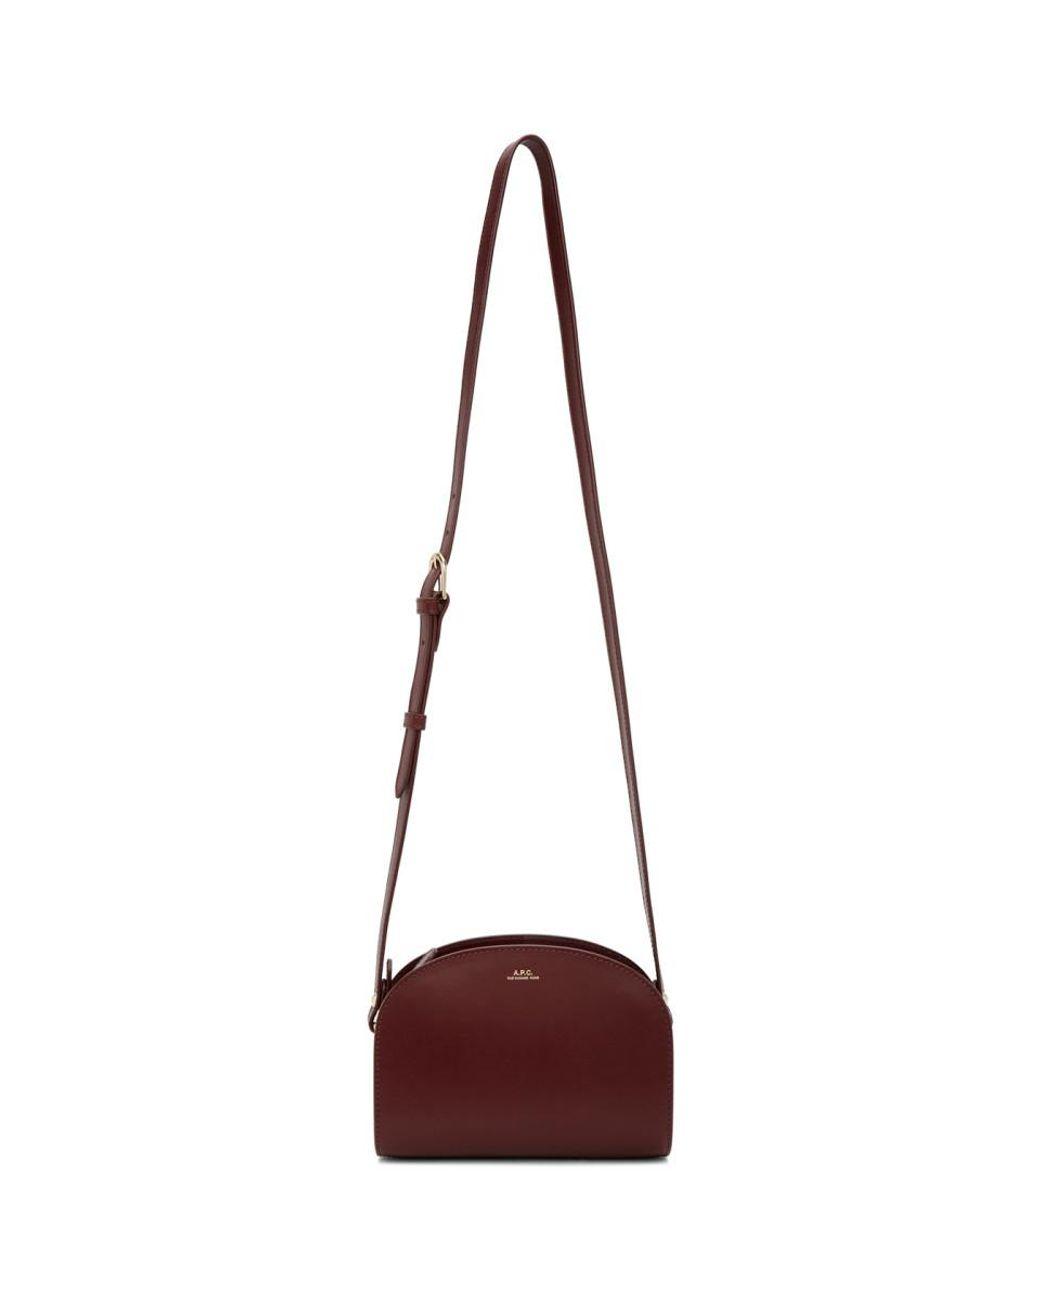 A.P.C. Leather Burgundy Mini Demi-lune Bag - Lyst